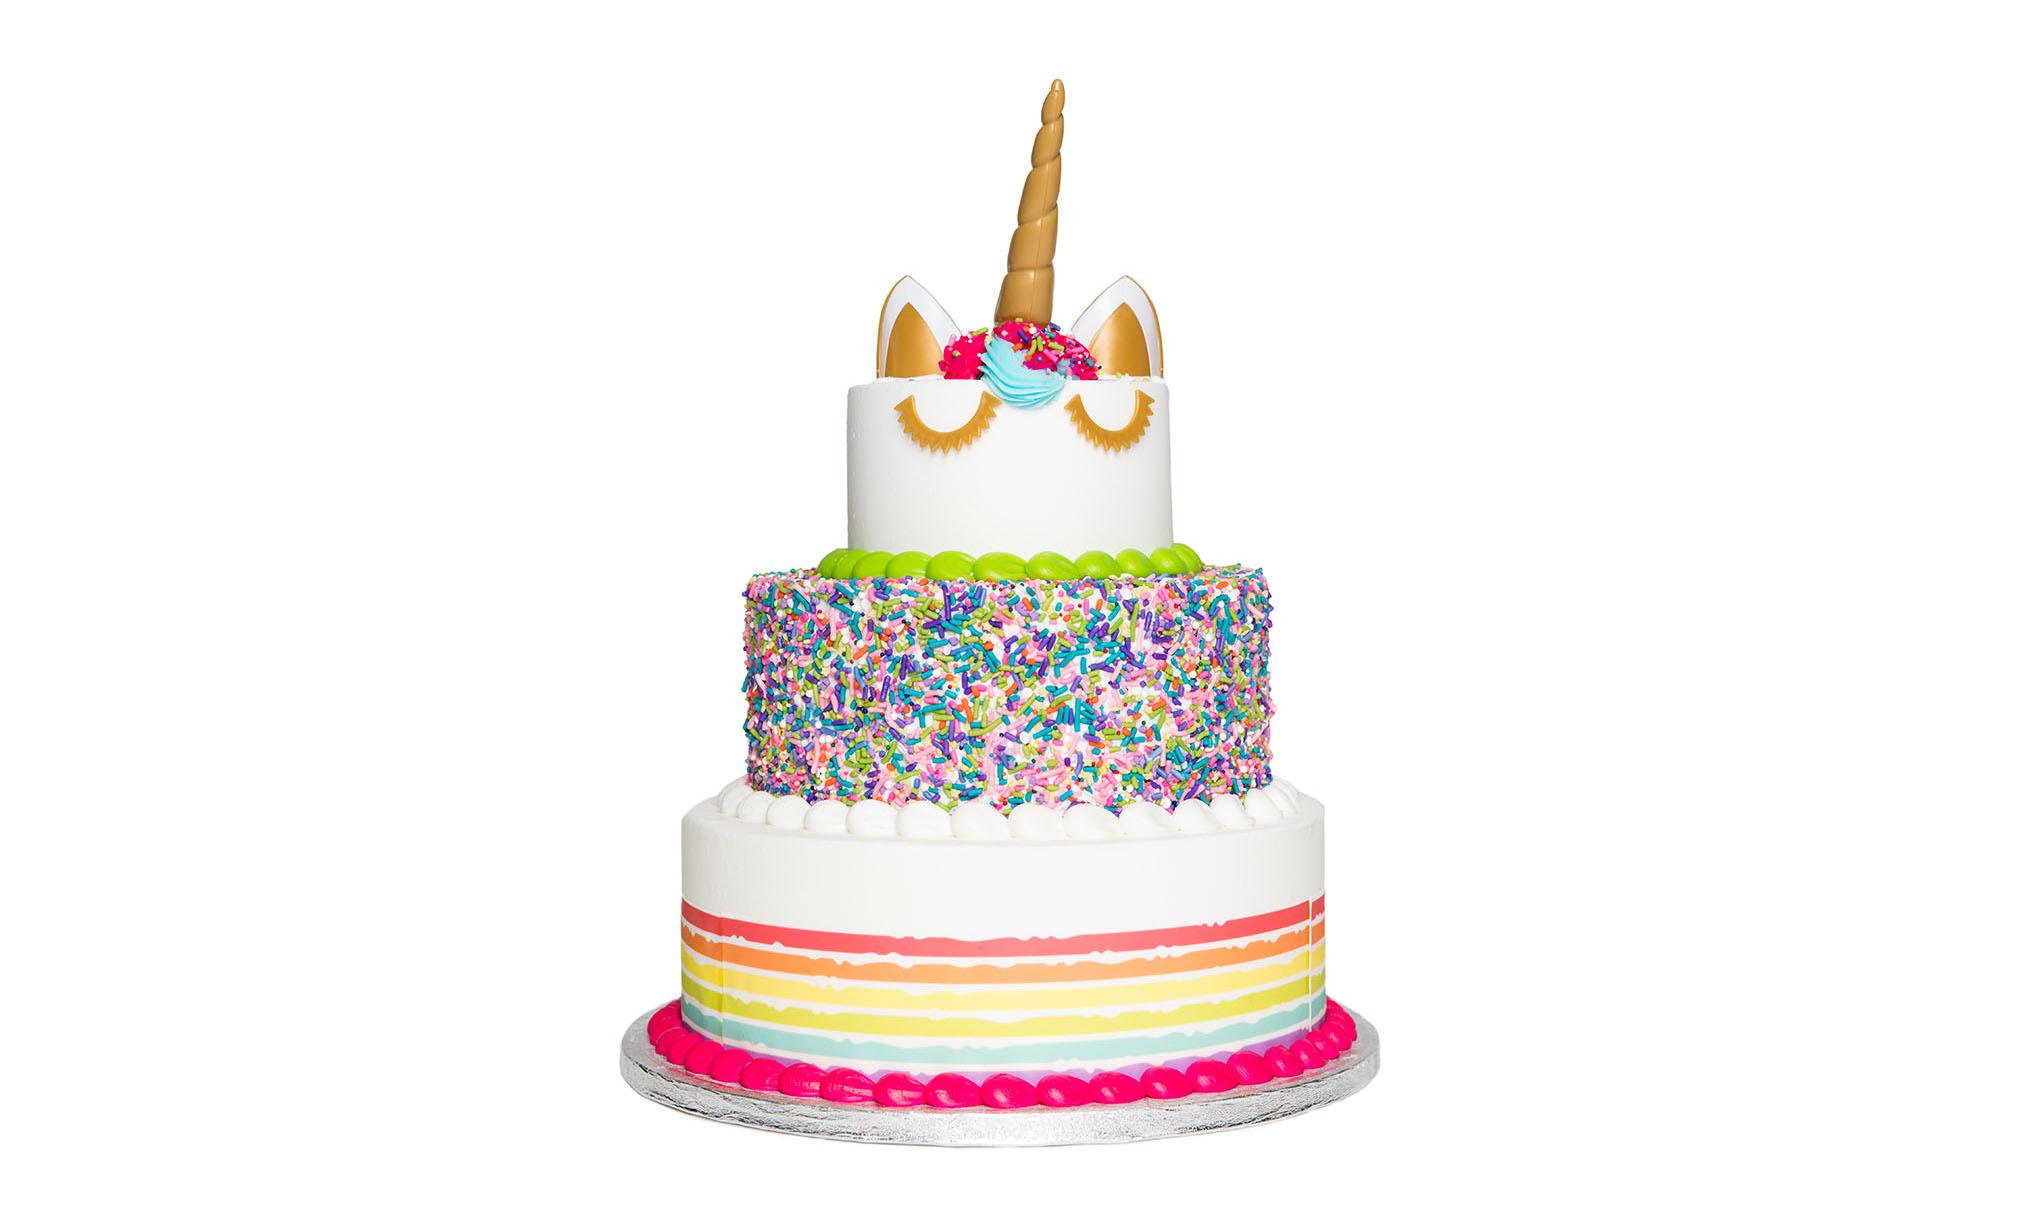 Sam S Club Stacks A Rainbow Cake For National Unicorn Day Gk